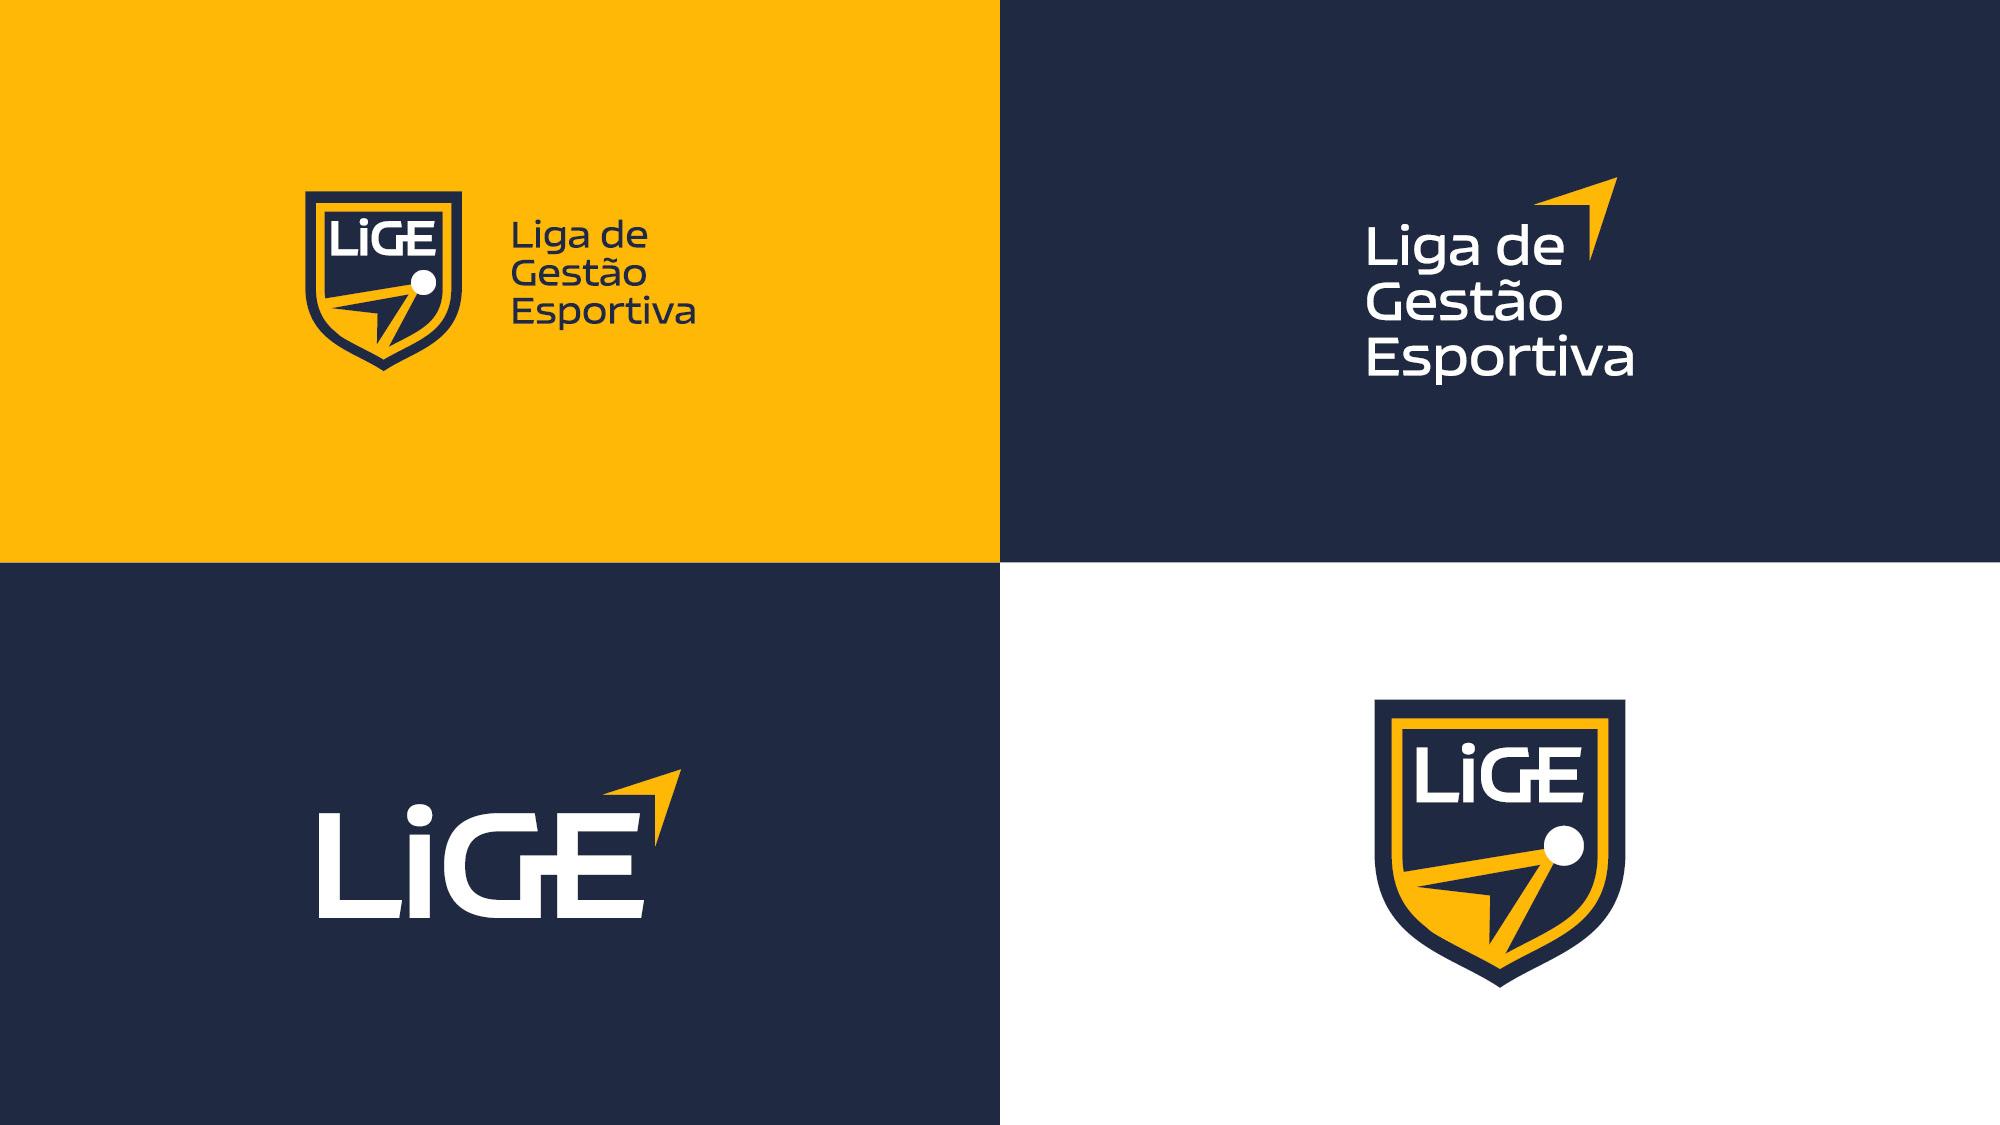 Lige-FGV-SP-Nacione-Branding5